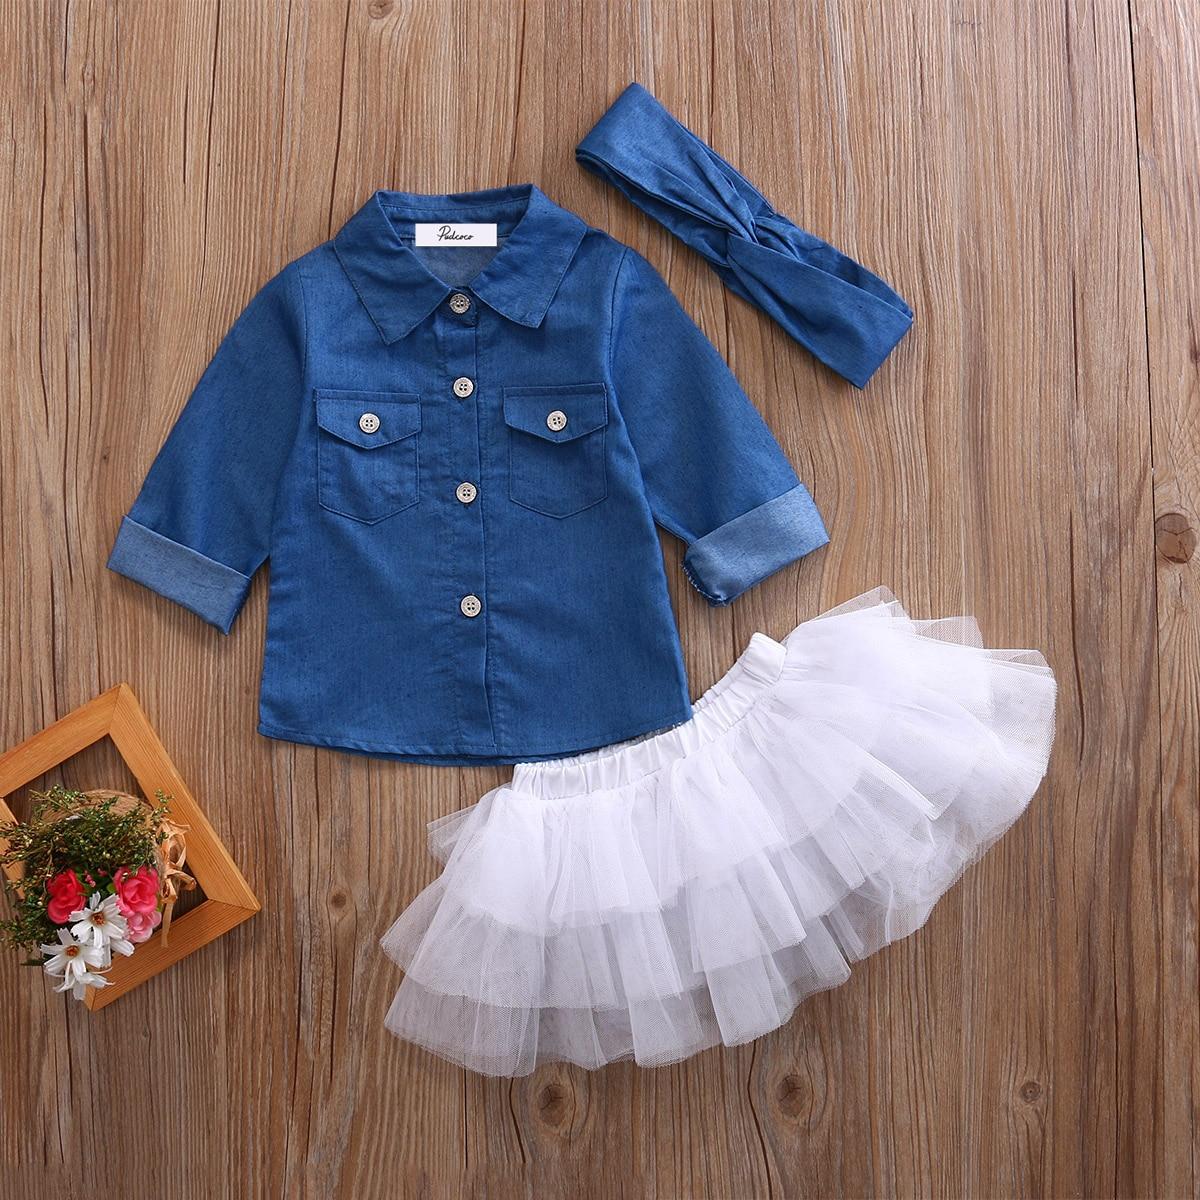 3PCS-Toddler-Kids-Baby-Girl-Clothes-Set-Denim-Tops-T-shirt-Tutu-Skirt-Headband-Outfits-Summer-Cowboy-Suit-Children-Set-0-5Y-1